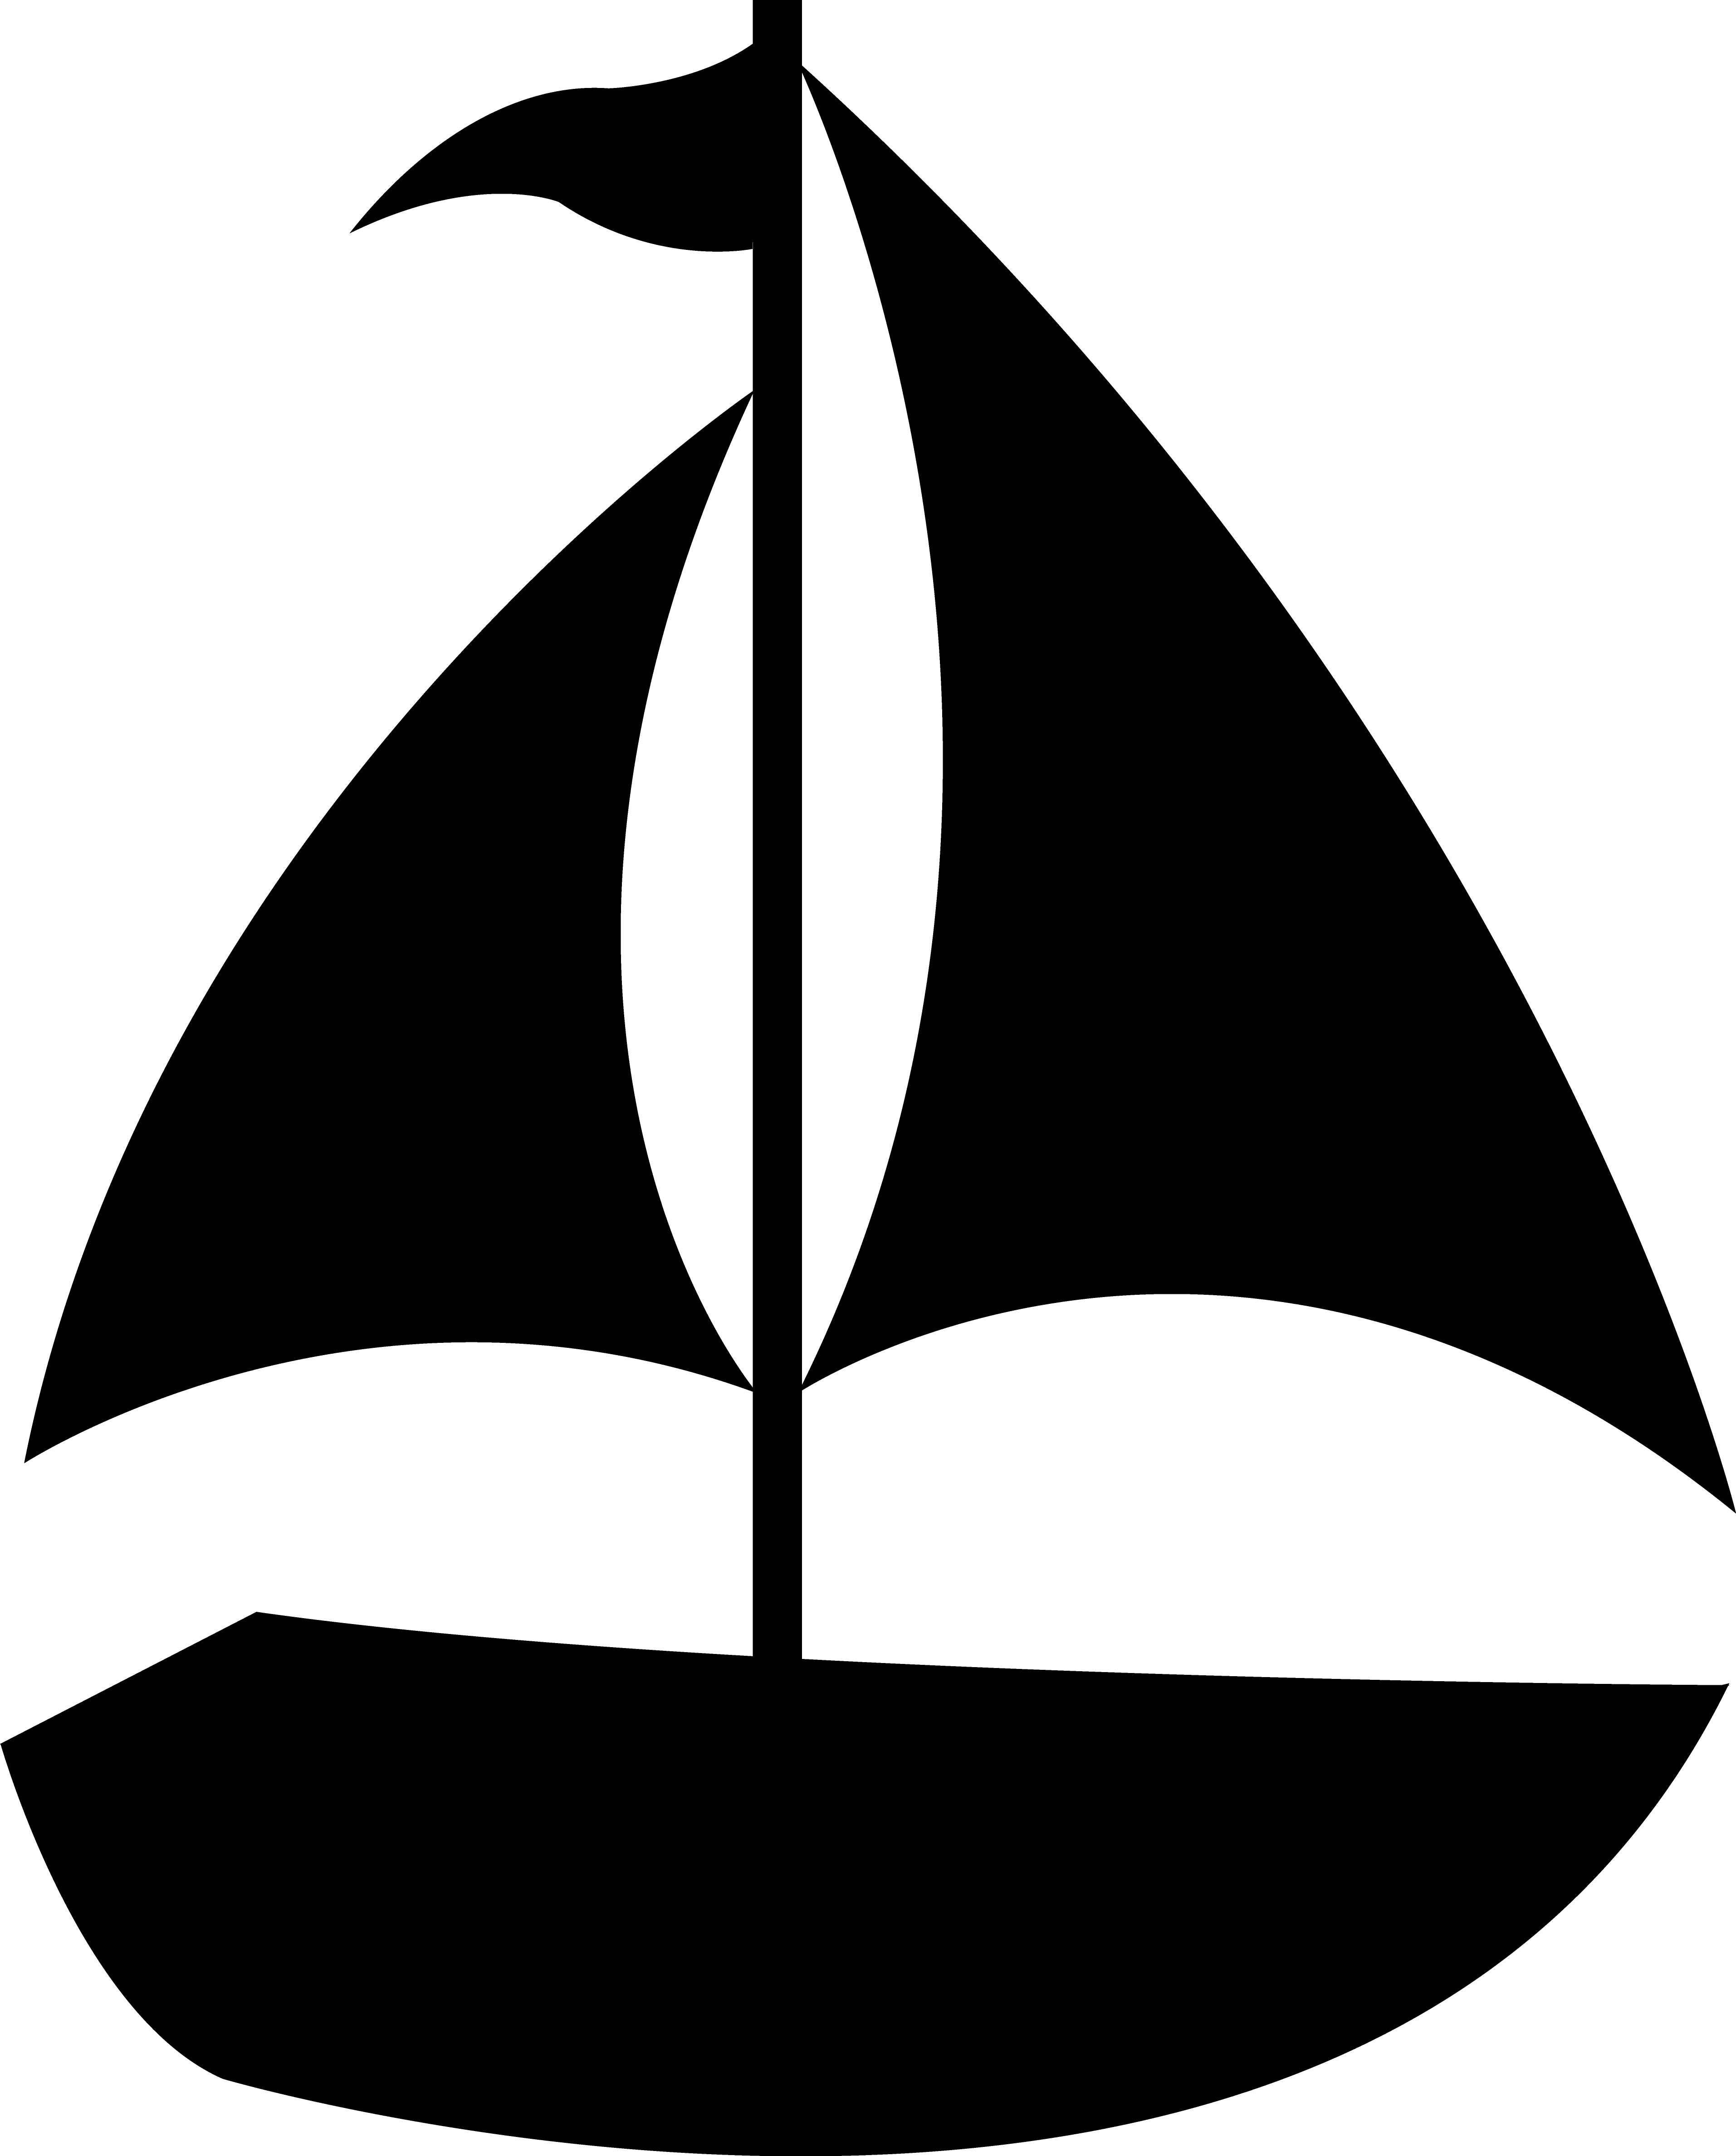 3827x4754 Black Sailboat Silhouette